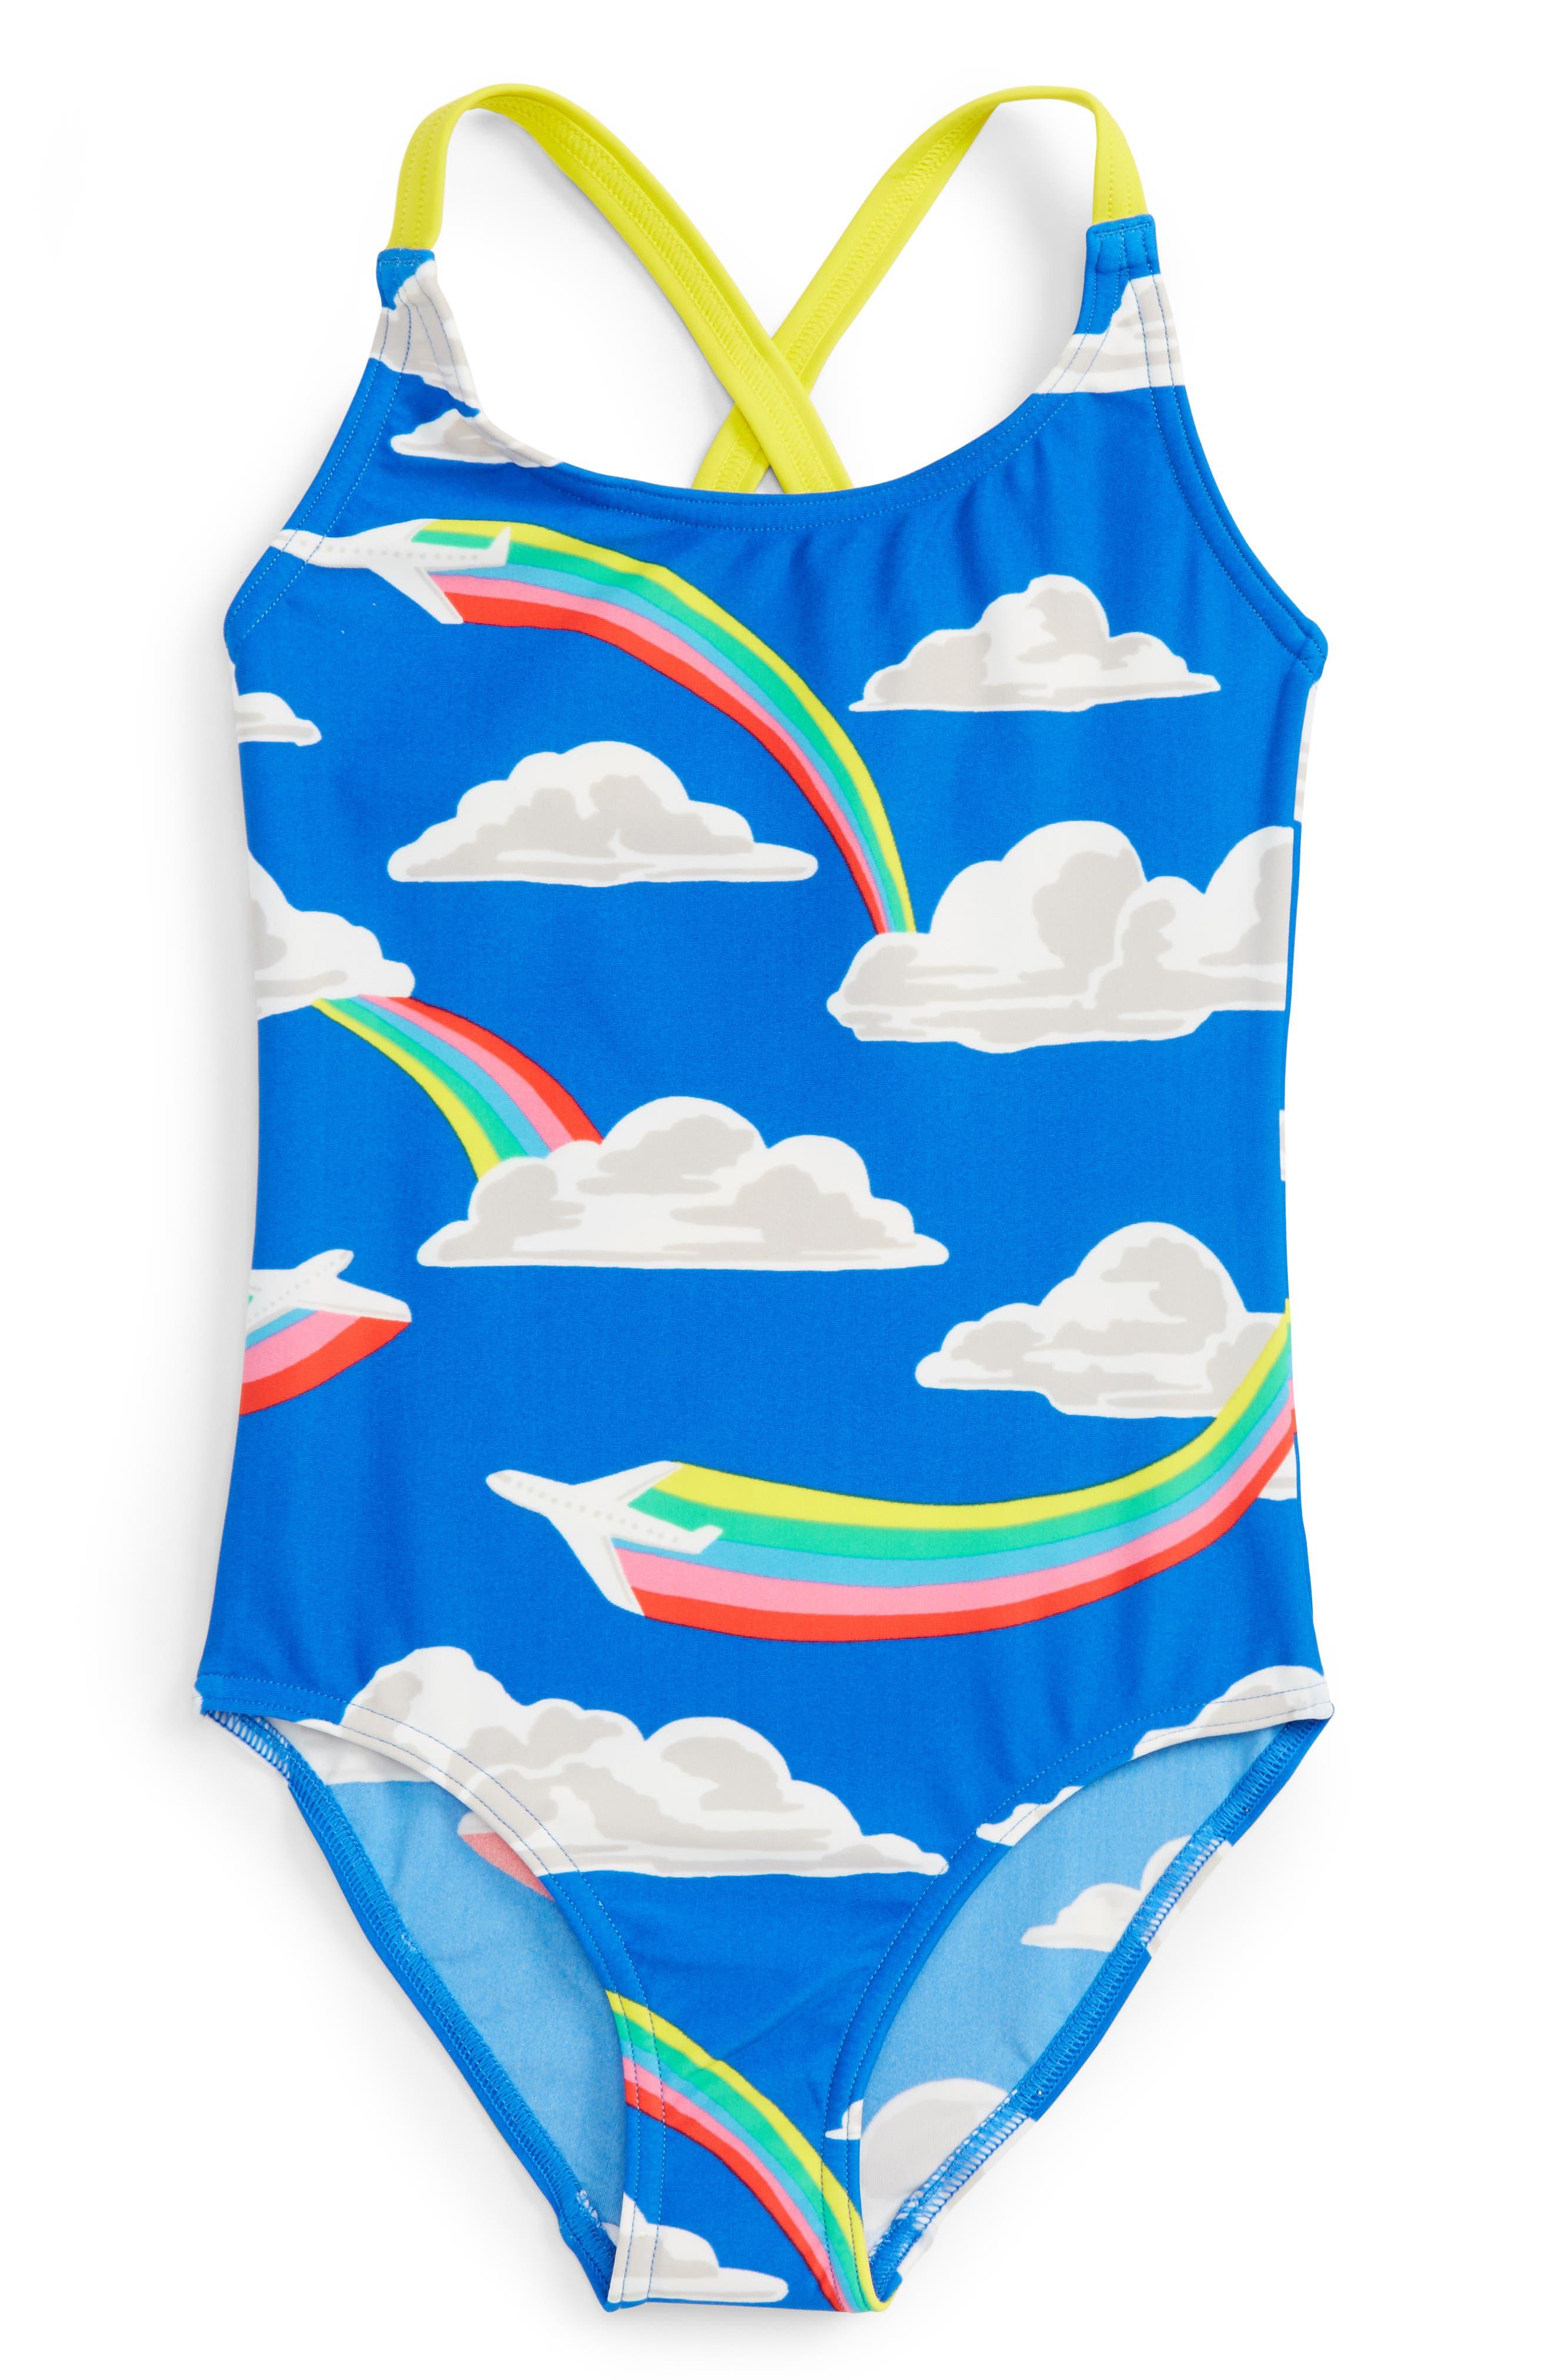 Main Image - Mini Boden Fun One-Piece Swimsuit (Toddler Girls, Little Girls & Big Girls)